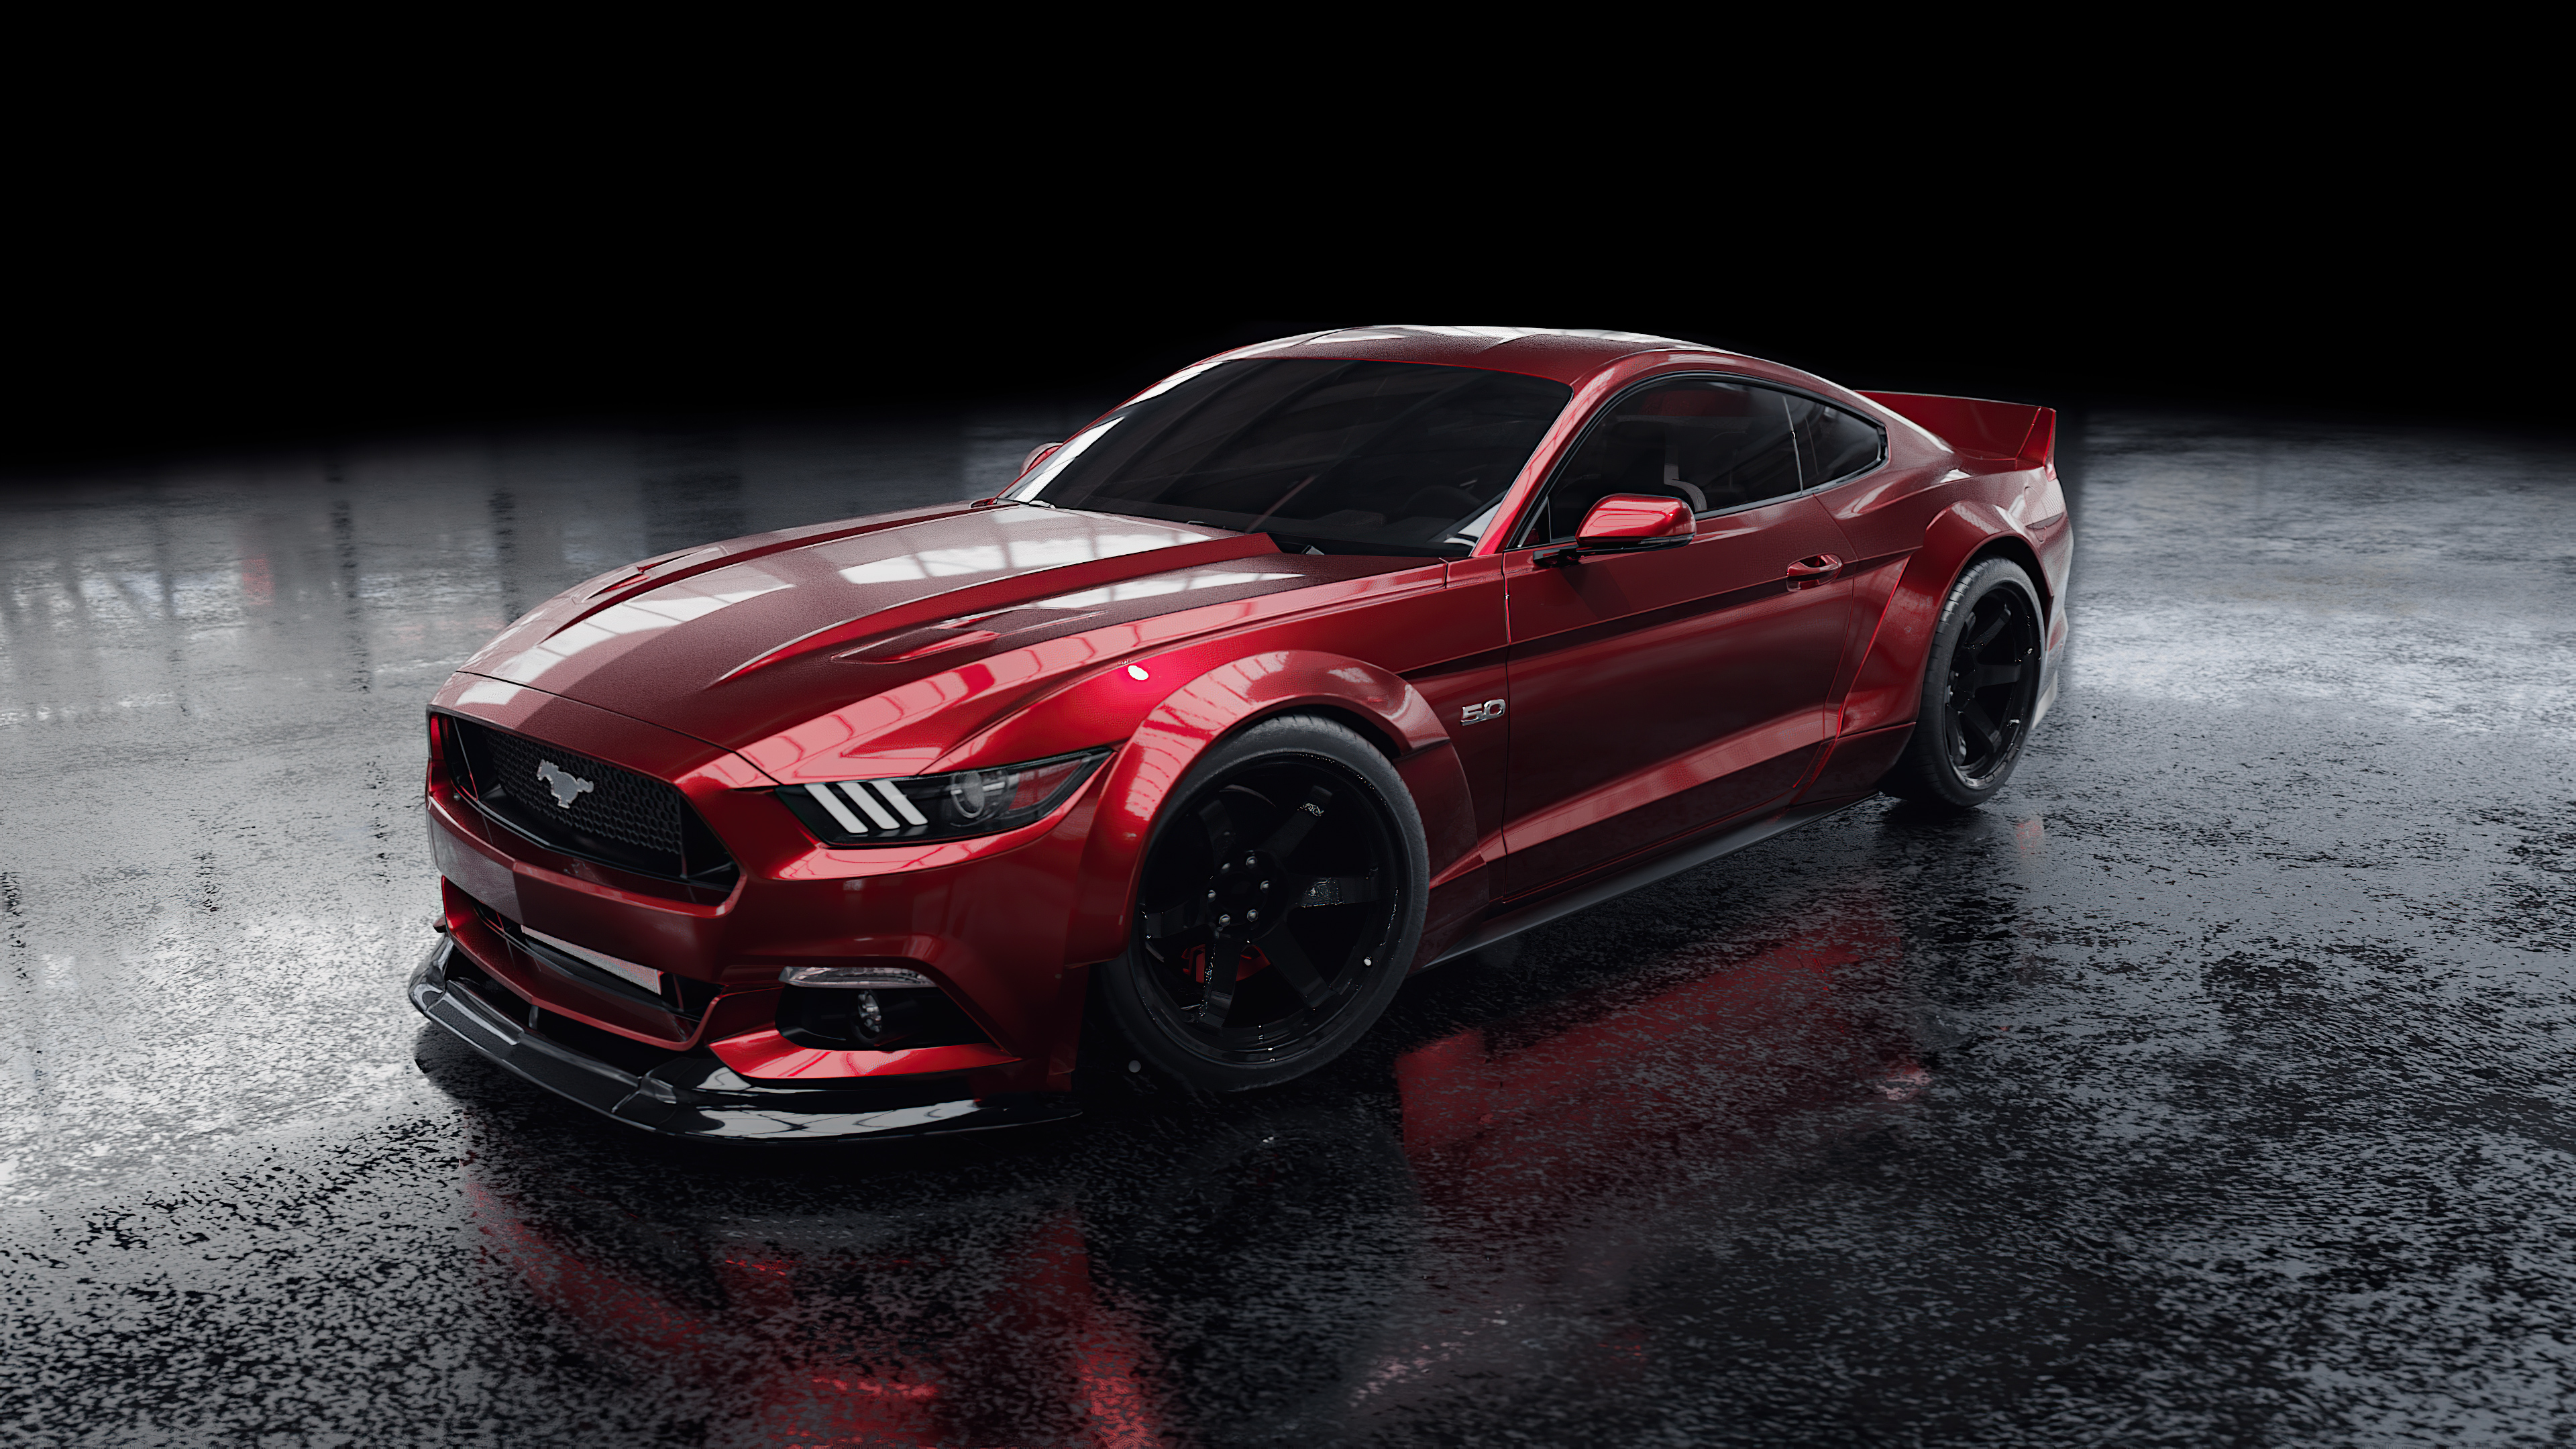 Fondos de pantalla Ford Mustang Rojo